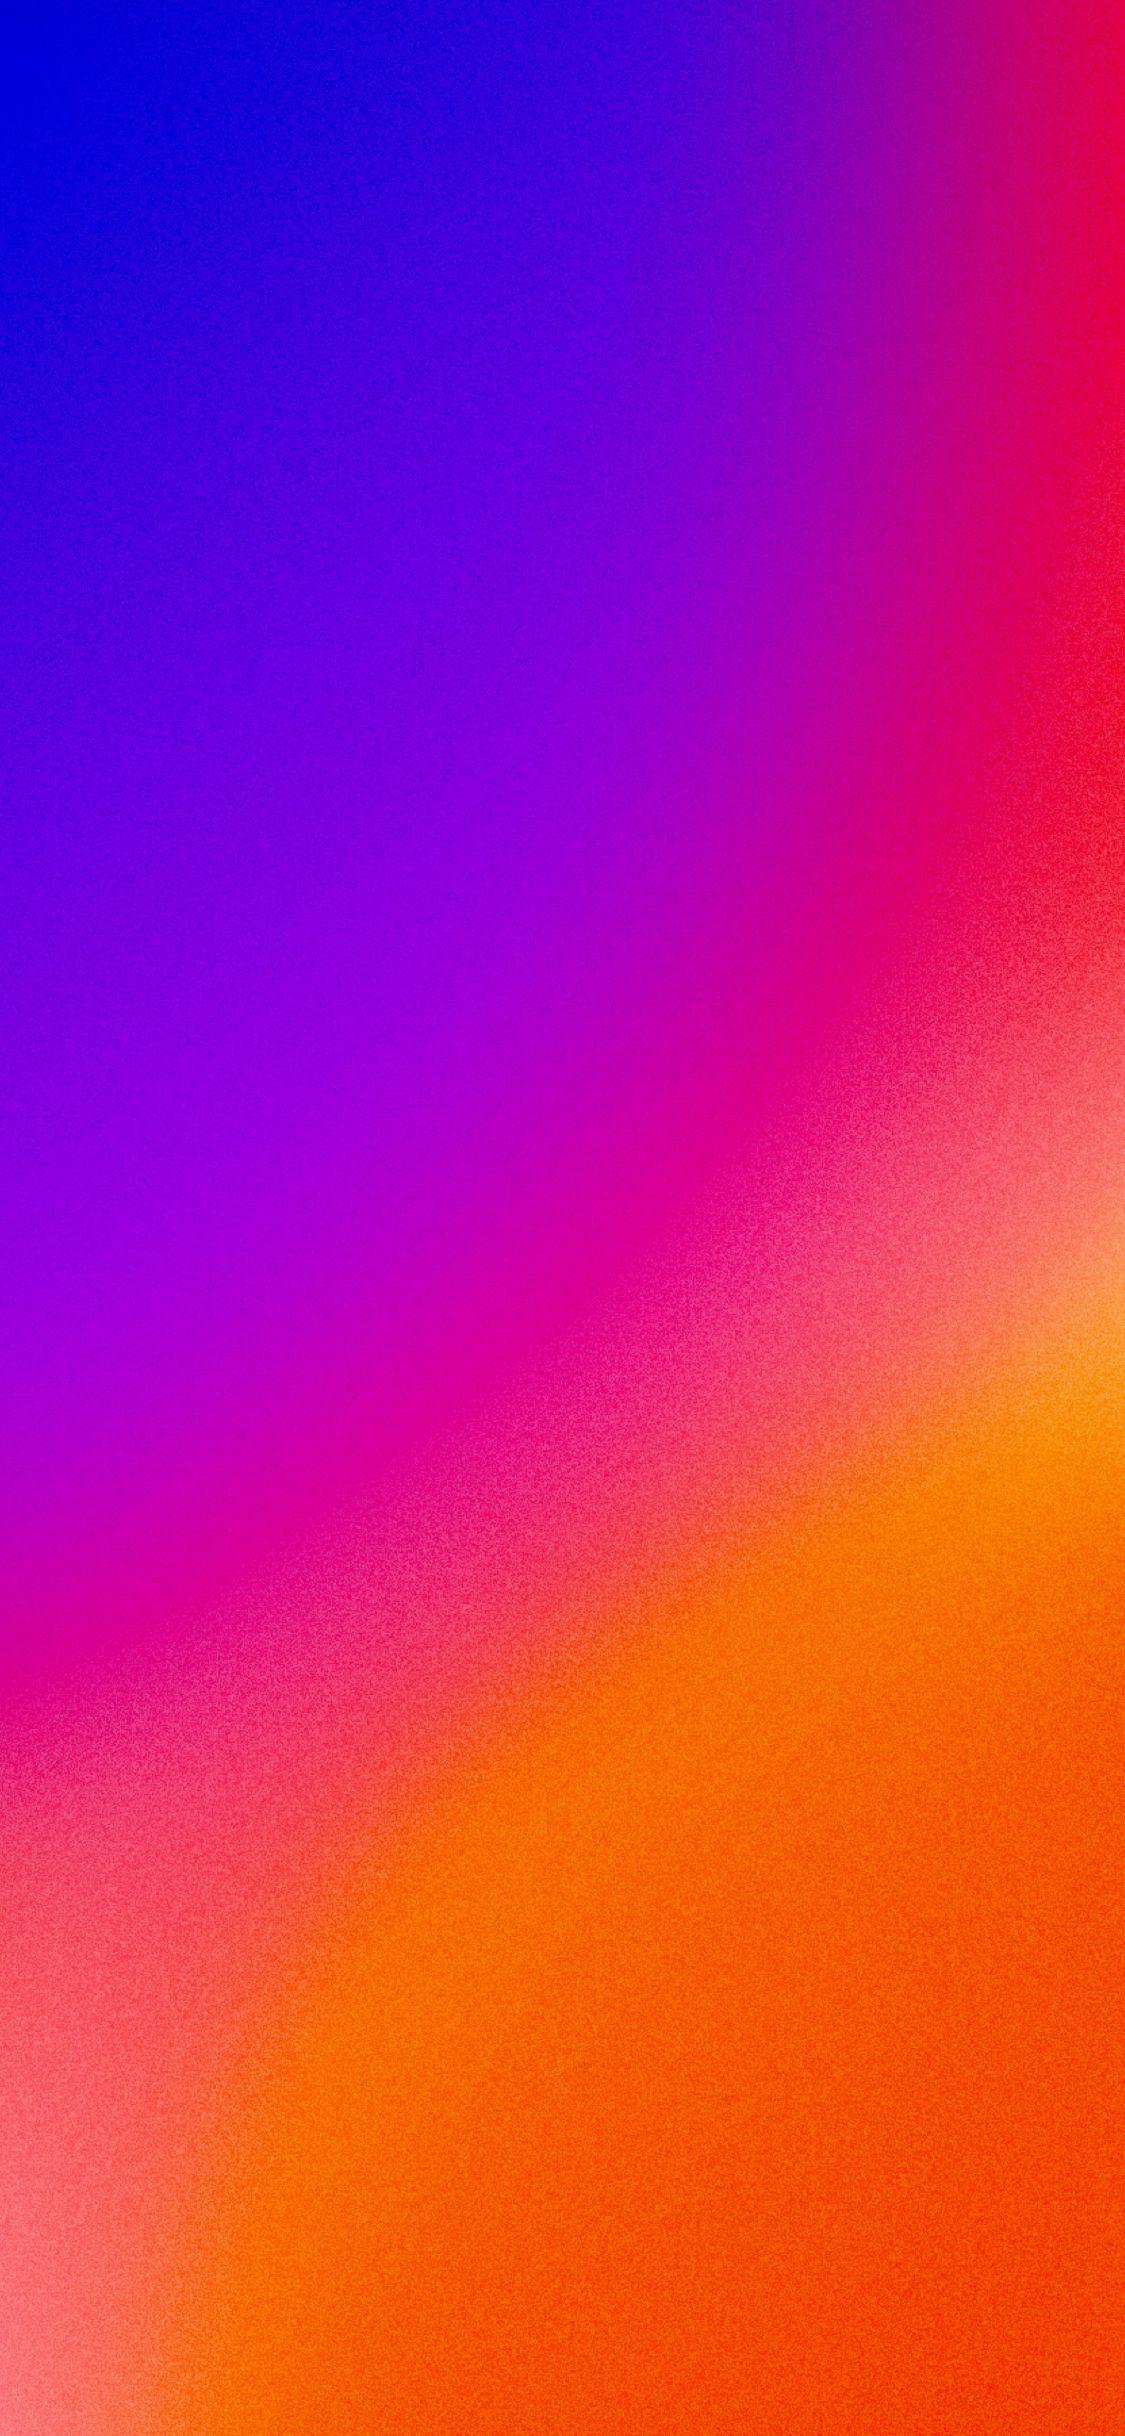 Iphone 11 Wallpaper Colorful 1125x2436 Wallpaper Teahub Io